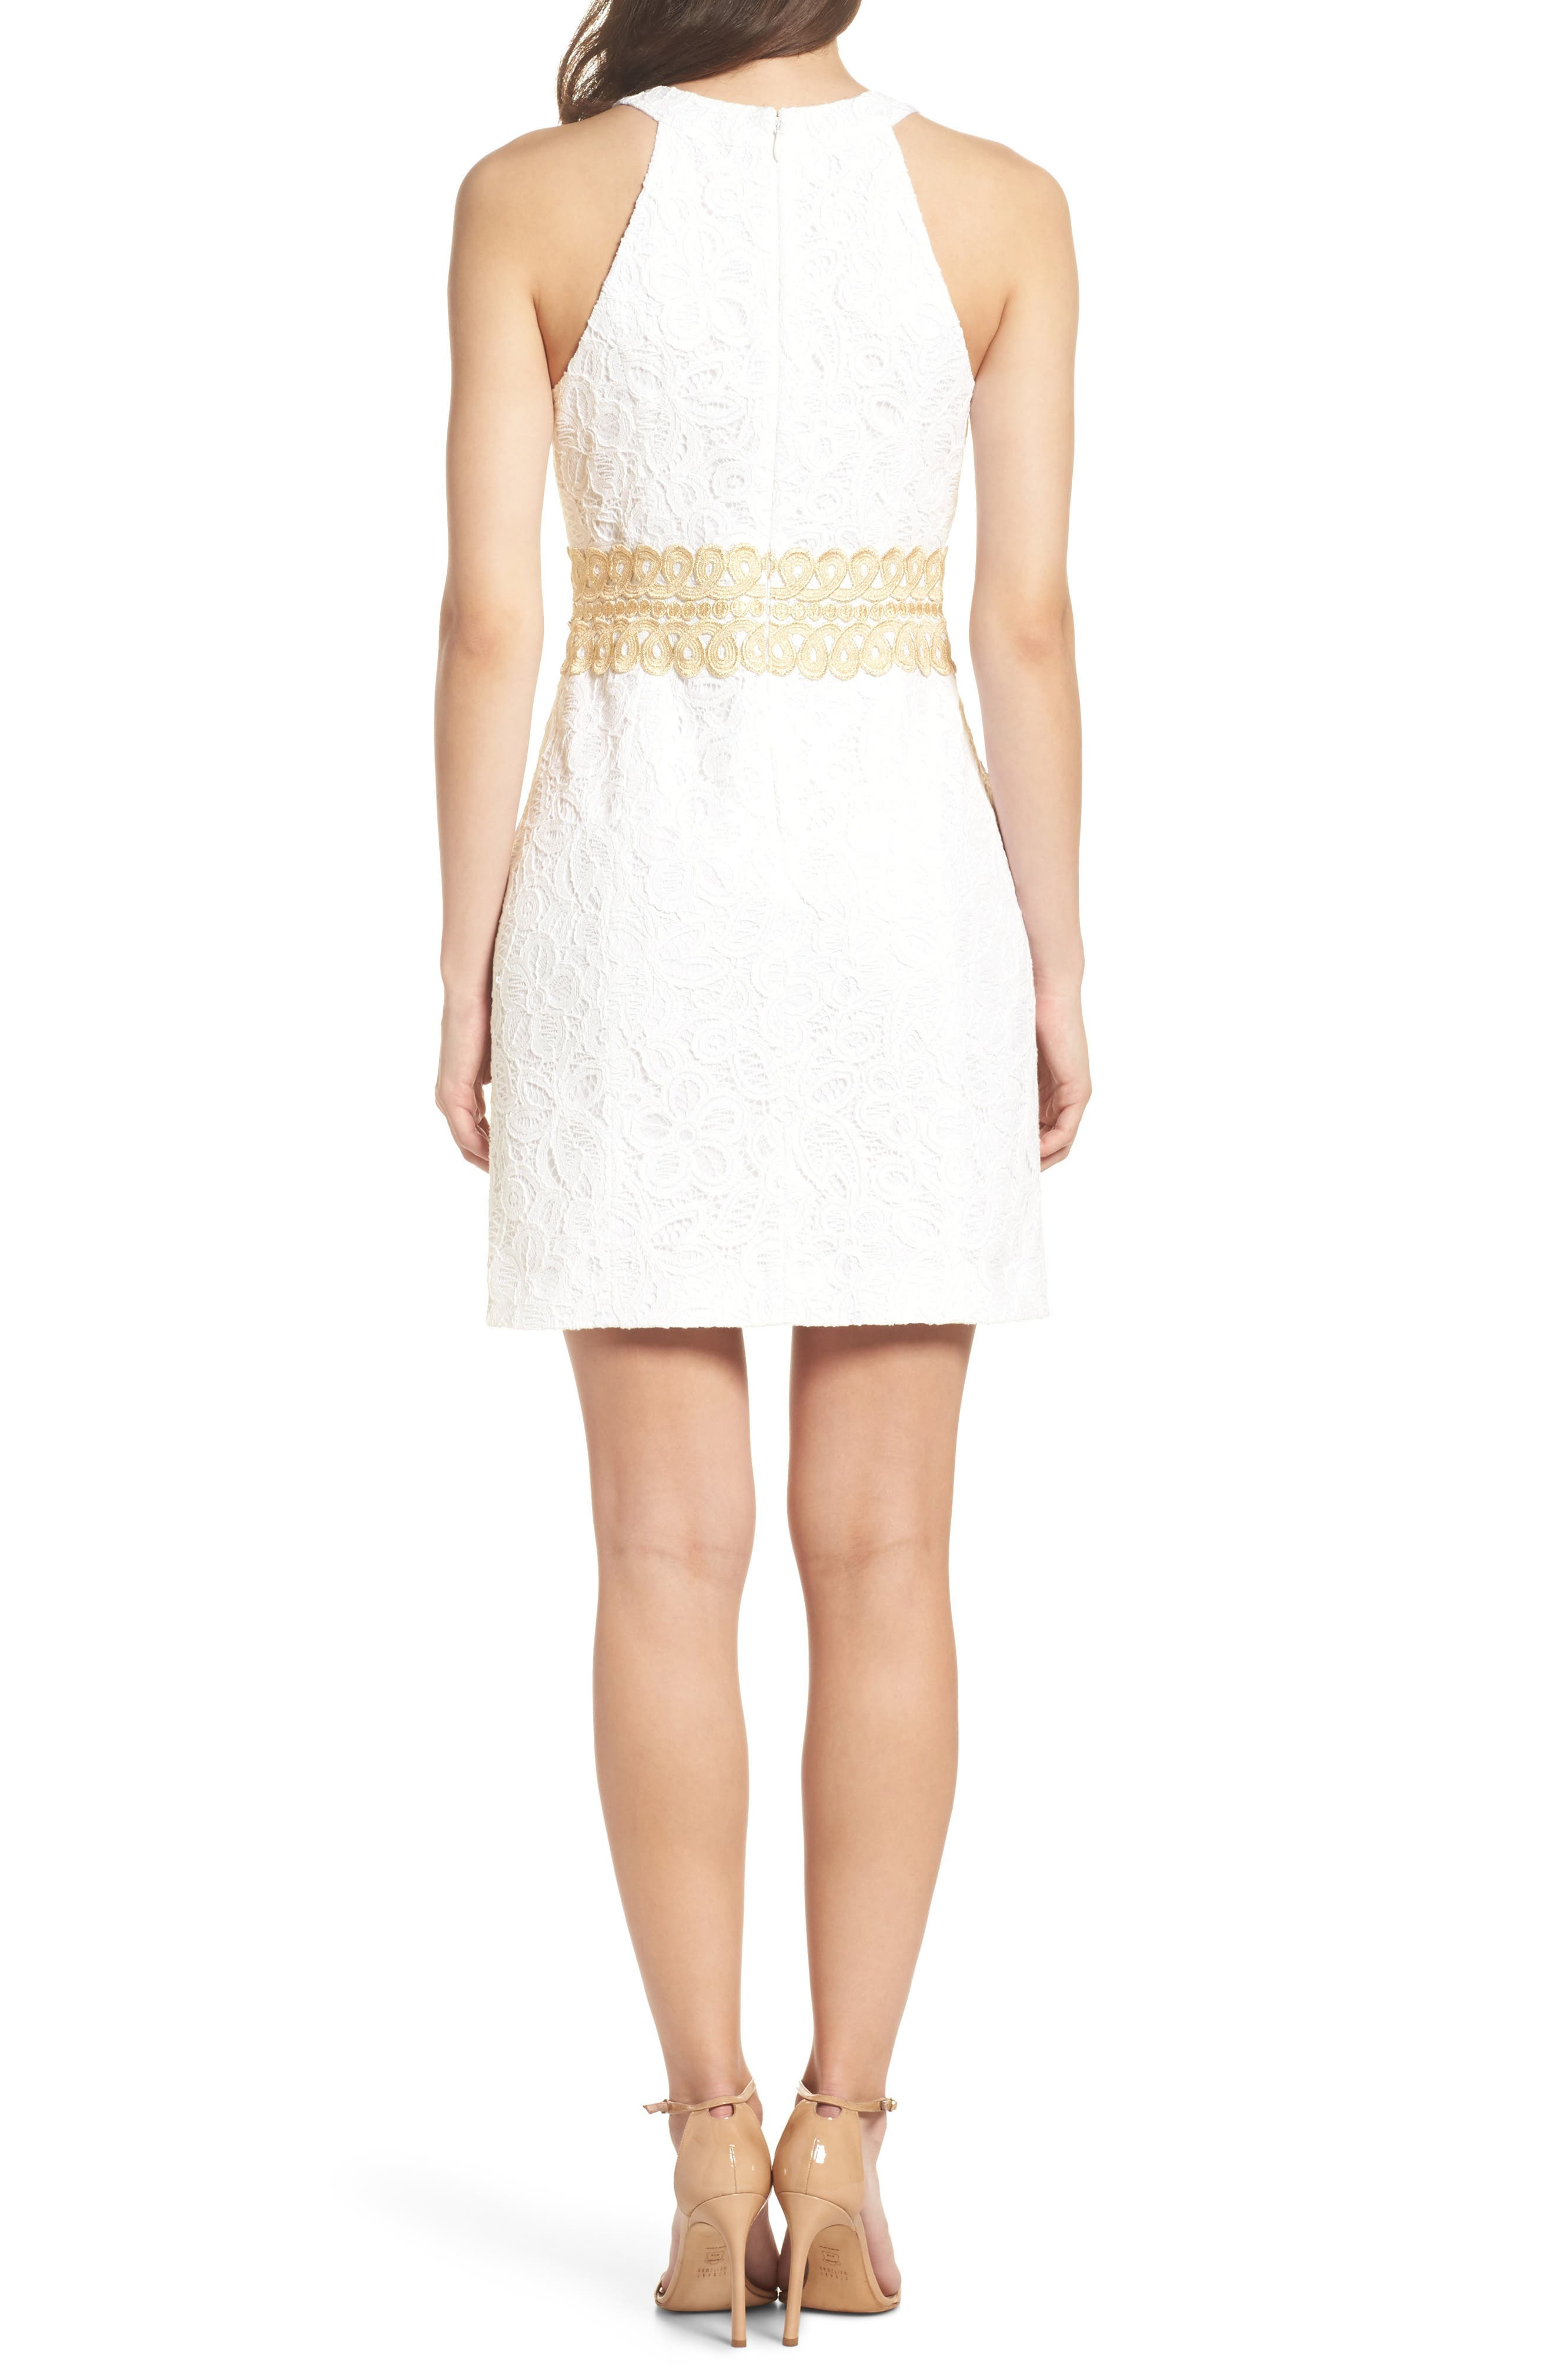 Ashlyn Lace Dress,                             Alternate thumbnail 2, color,                             Resort White Pop Floral Lace